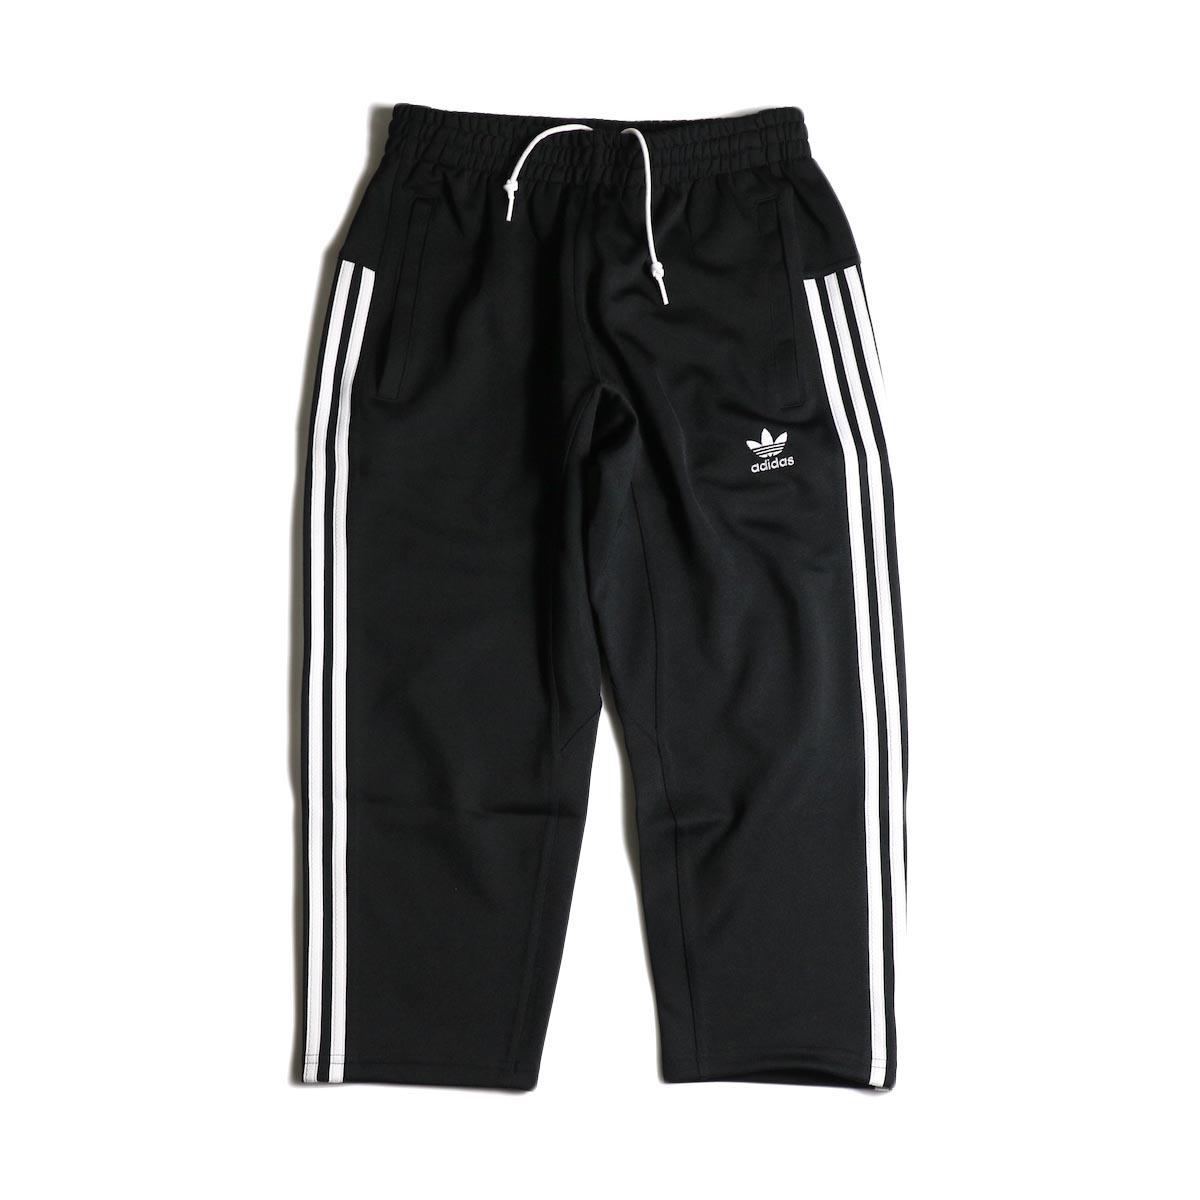 adidas / AC 7/8 PANTS (Black)